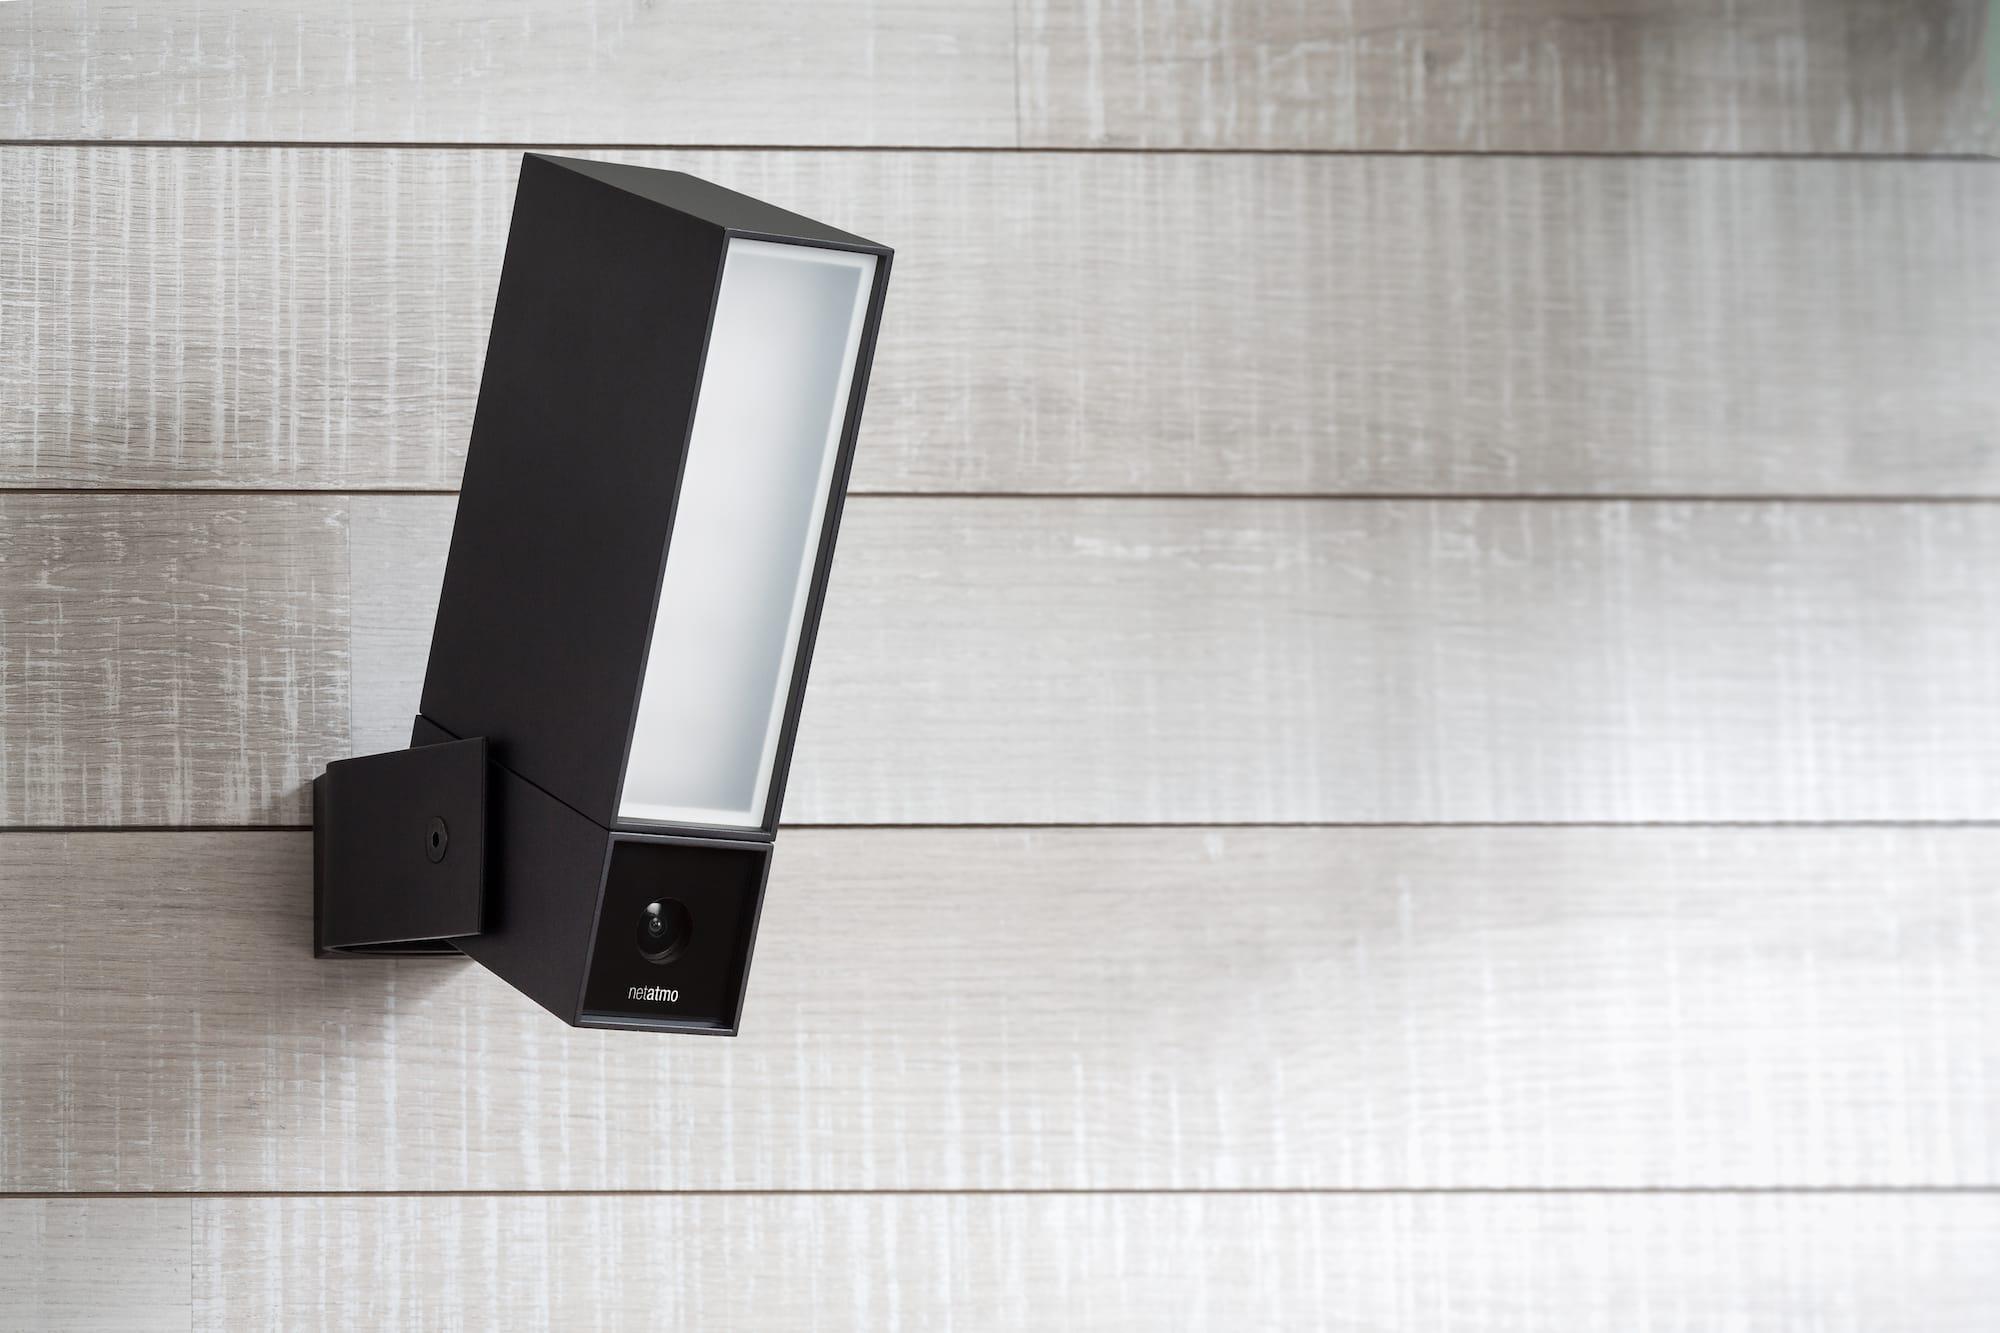 test netatmo presence imagazine. Black Bedroom Furniture Sets. Home Design Ideas